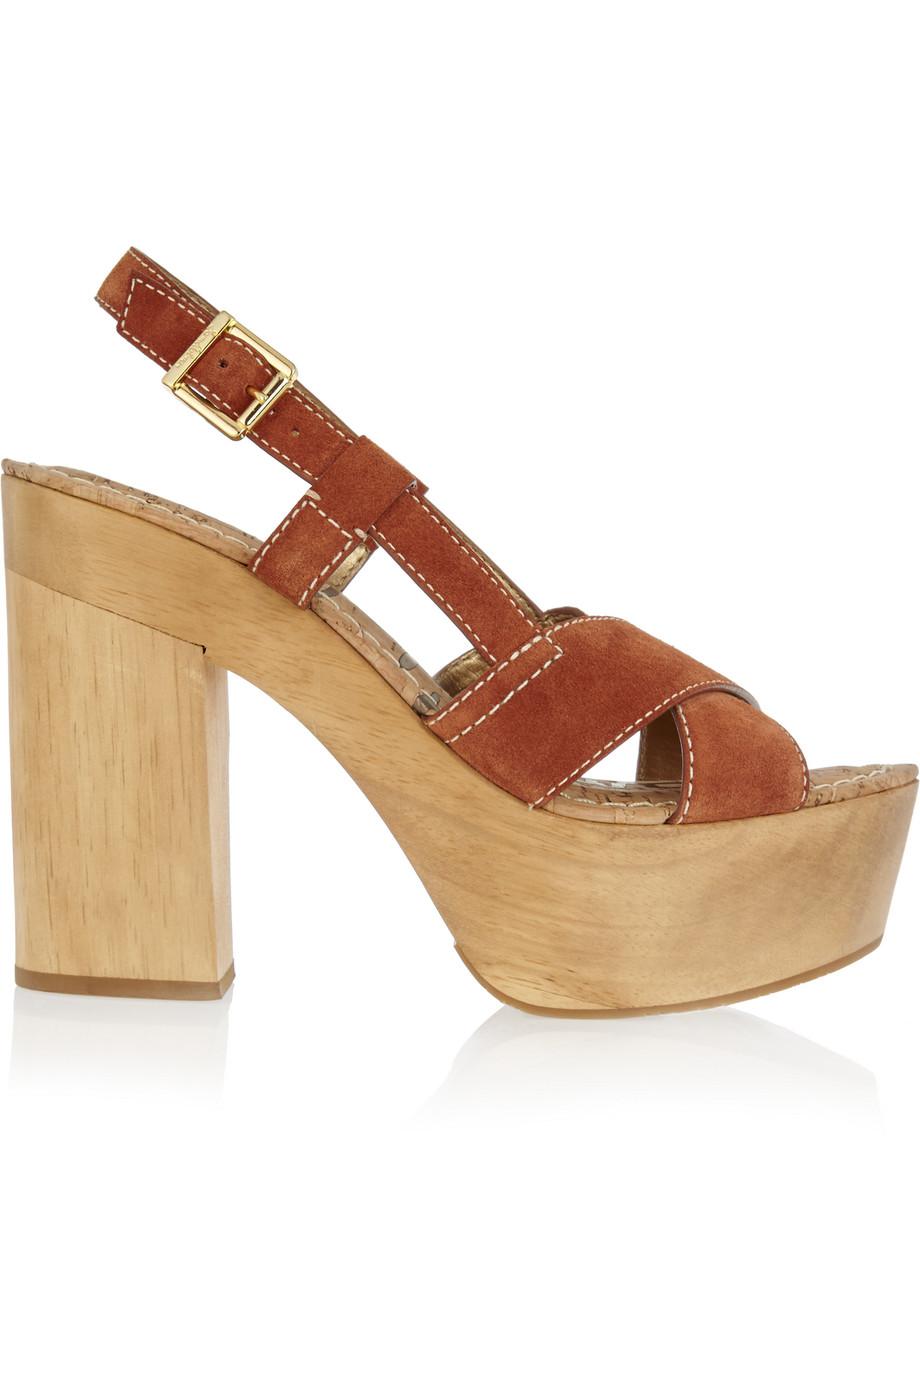 Mae Suede Platform Sandals, Tan, Women's, Size: 9